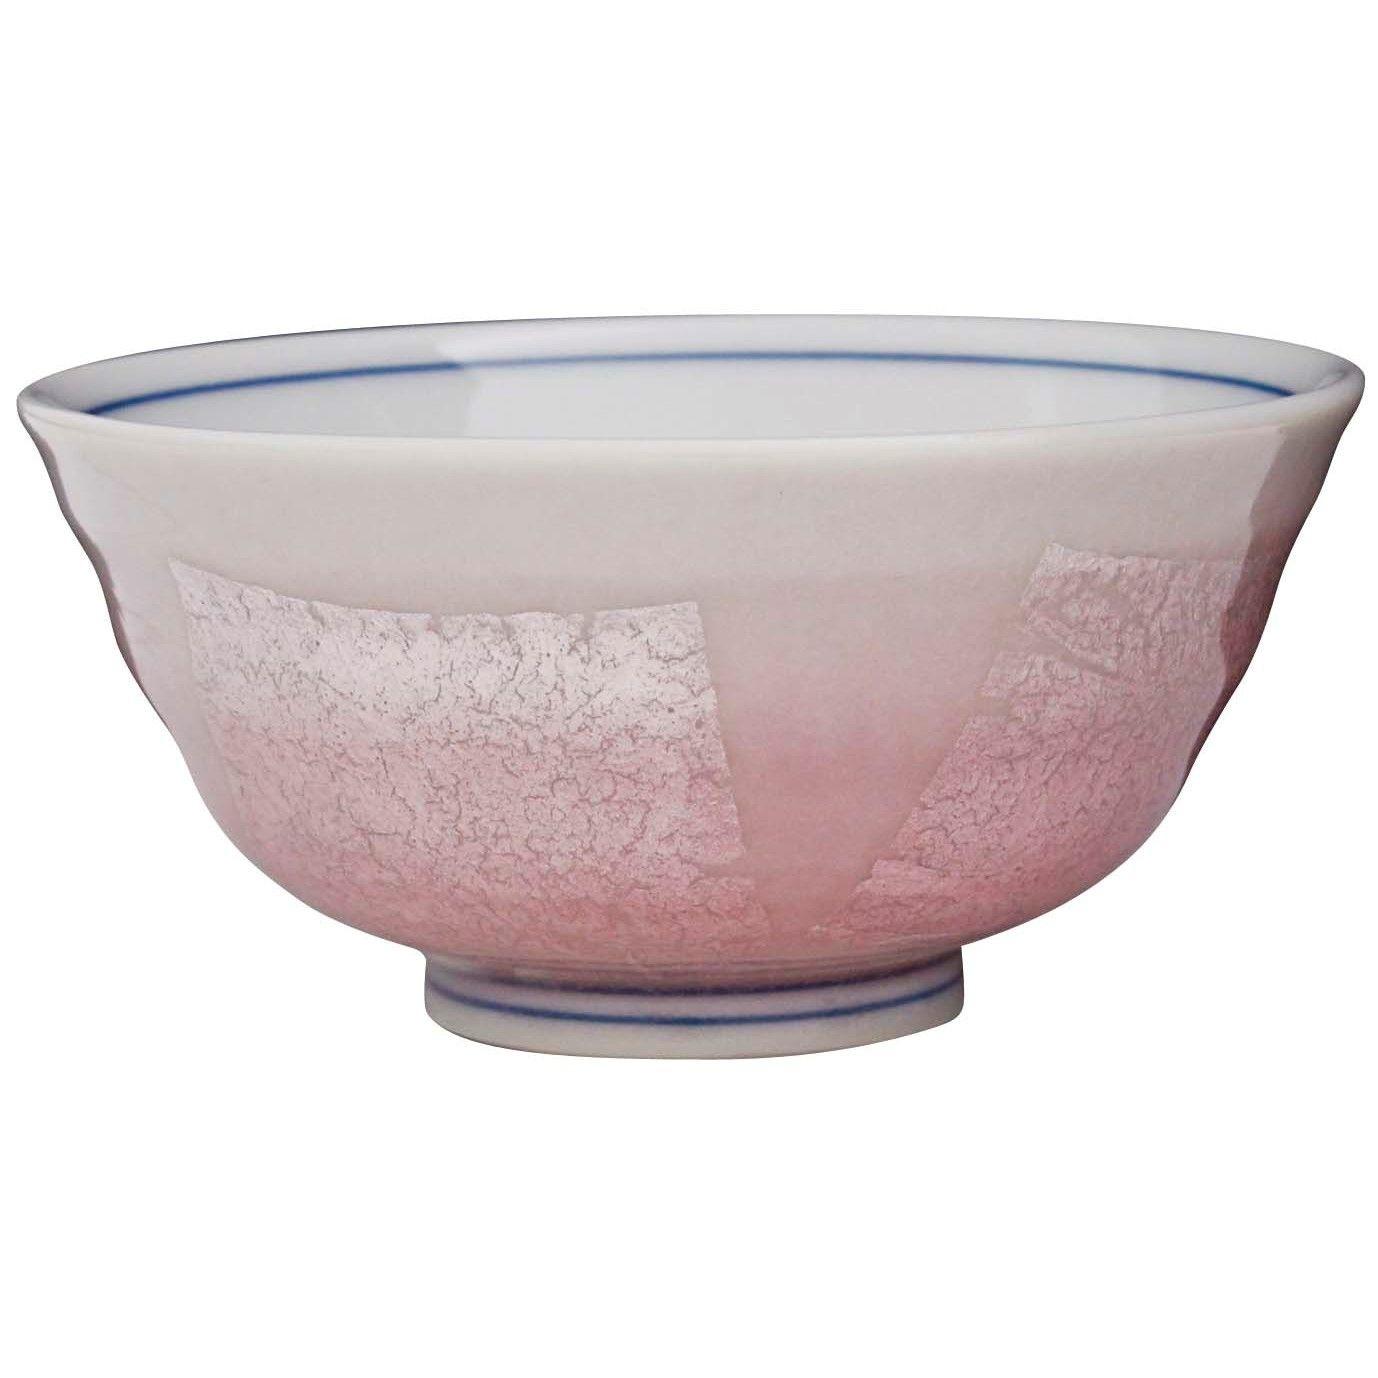 PK-21 姫碗 銀彩ピンク